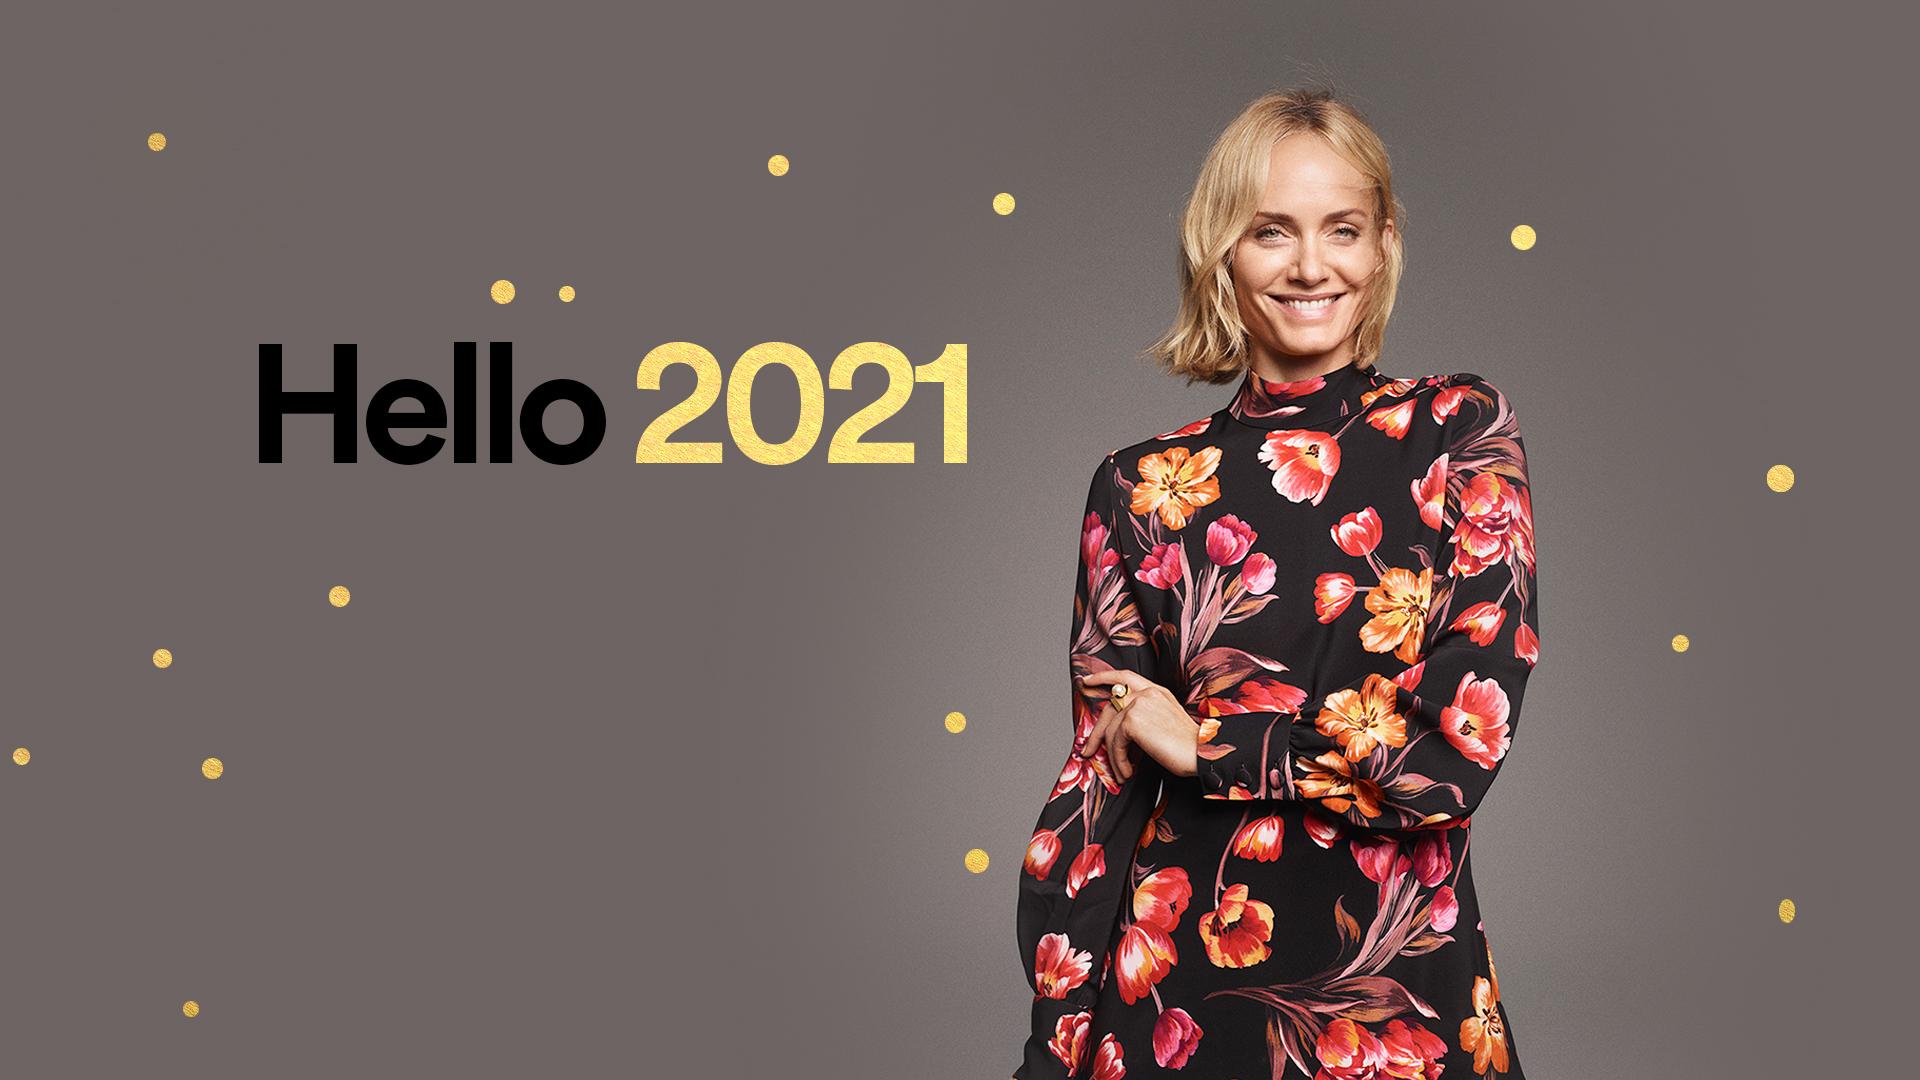 premiumoutlets.com homepage - hero - hello 2021 image